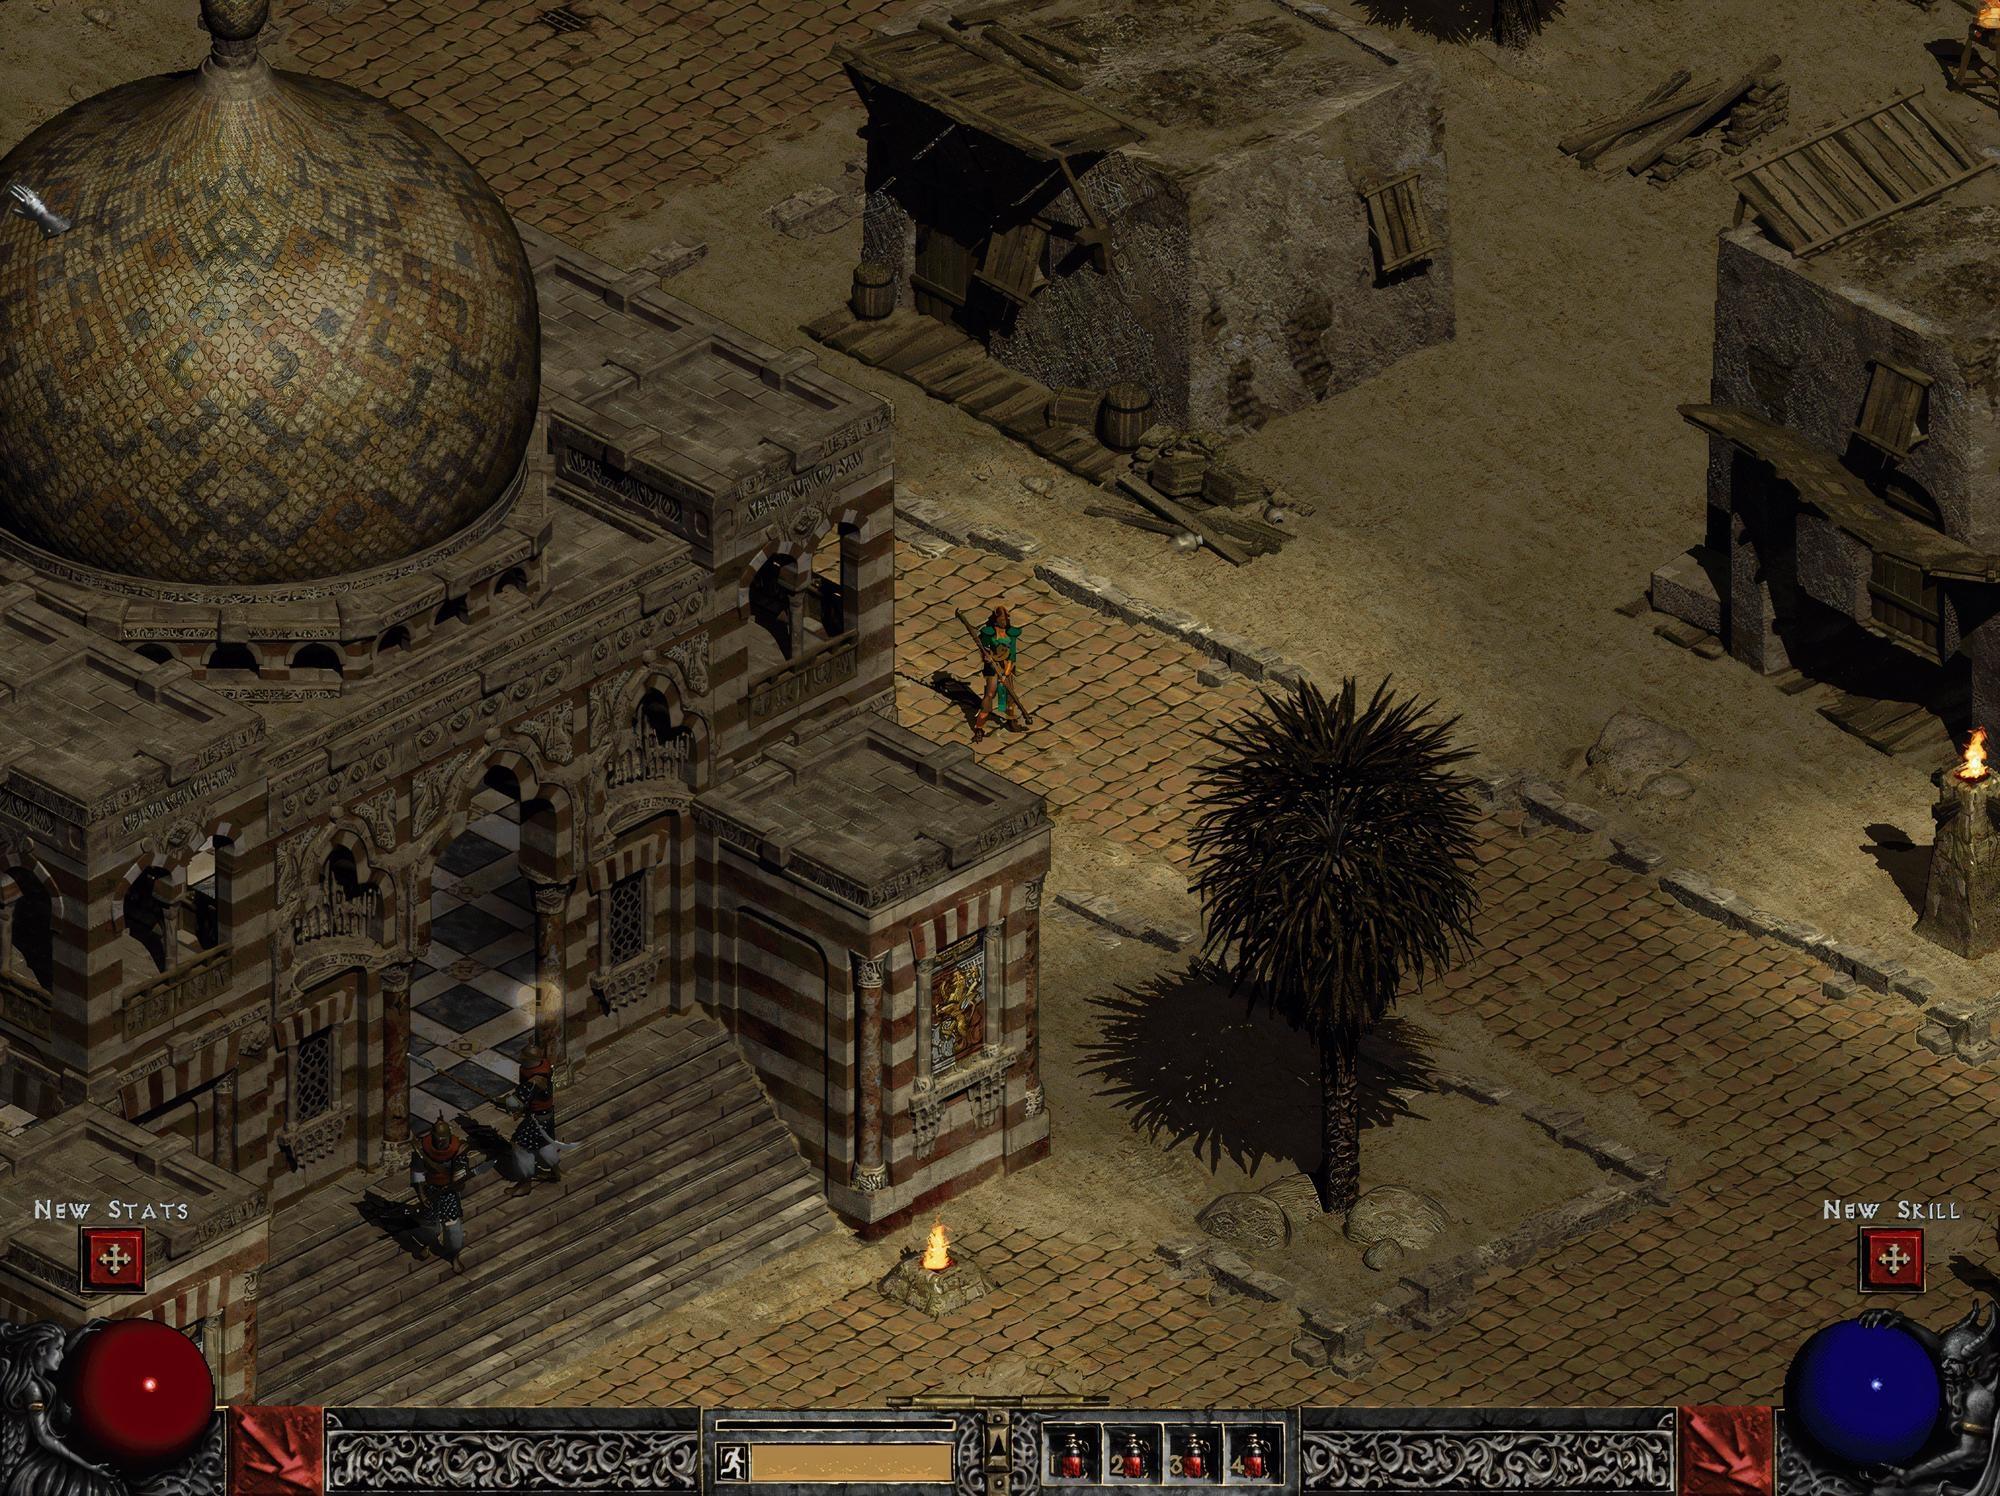 A neural network fan showed what Diablo II Remaster could